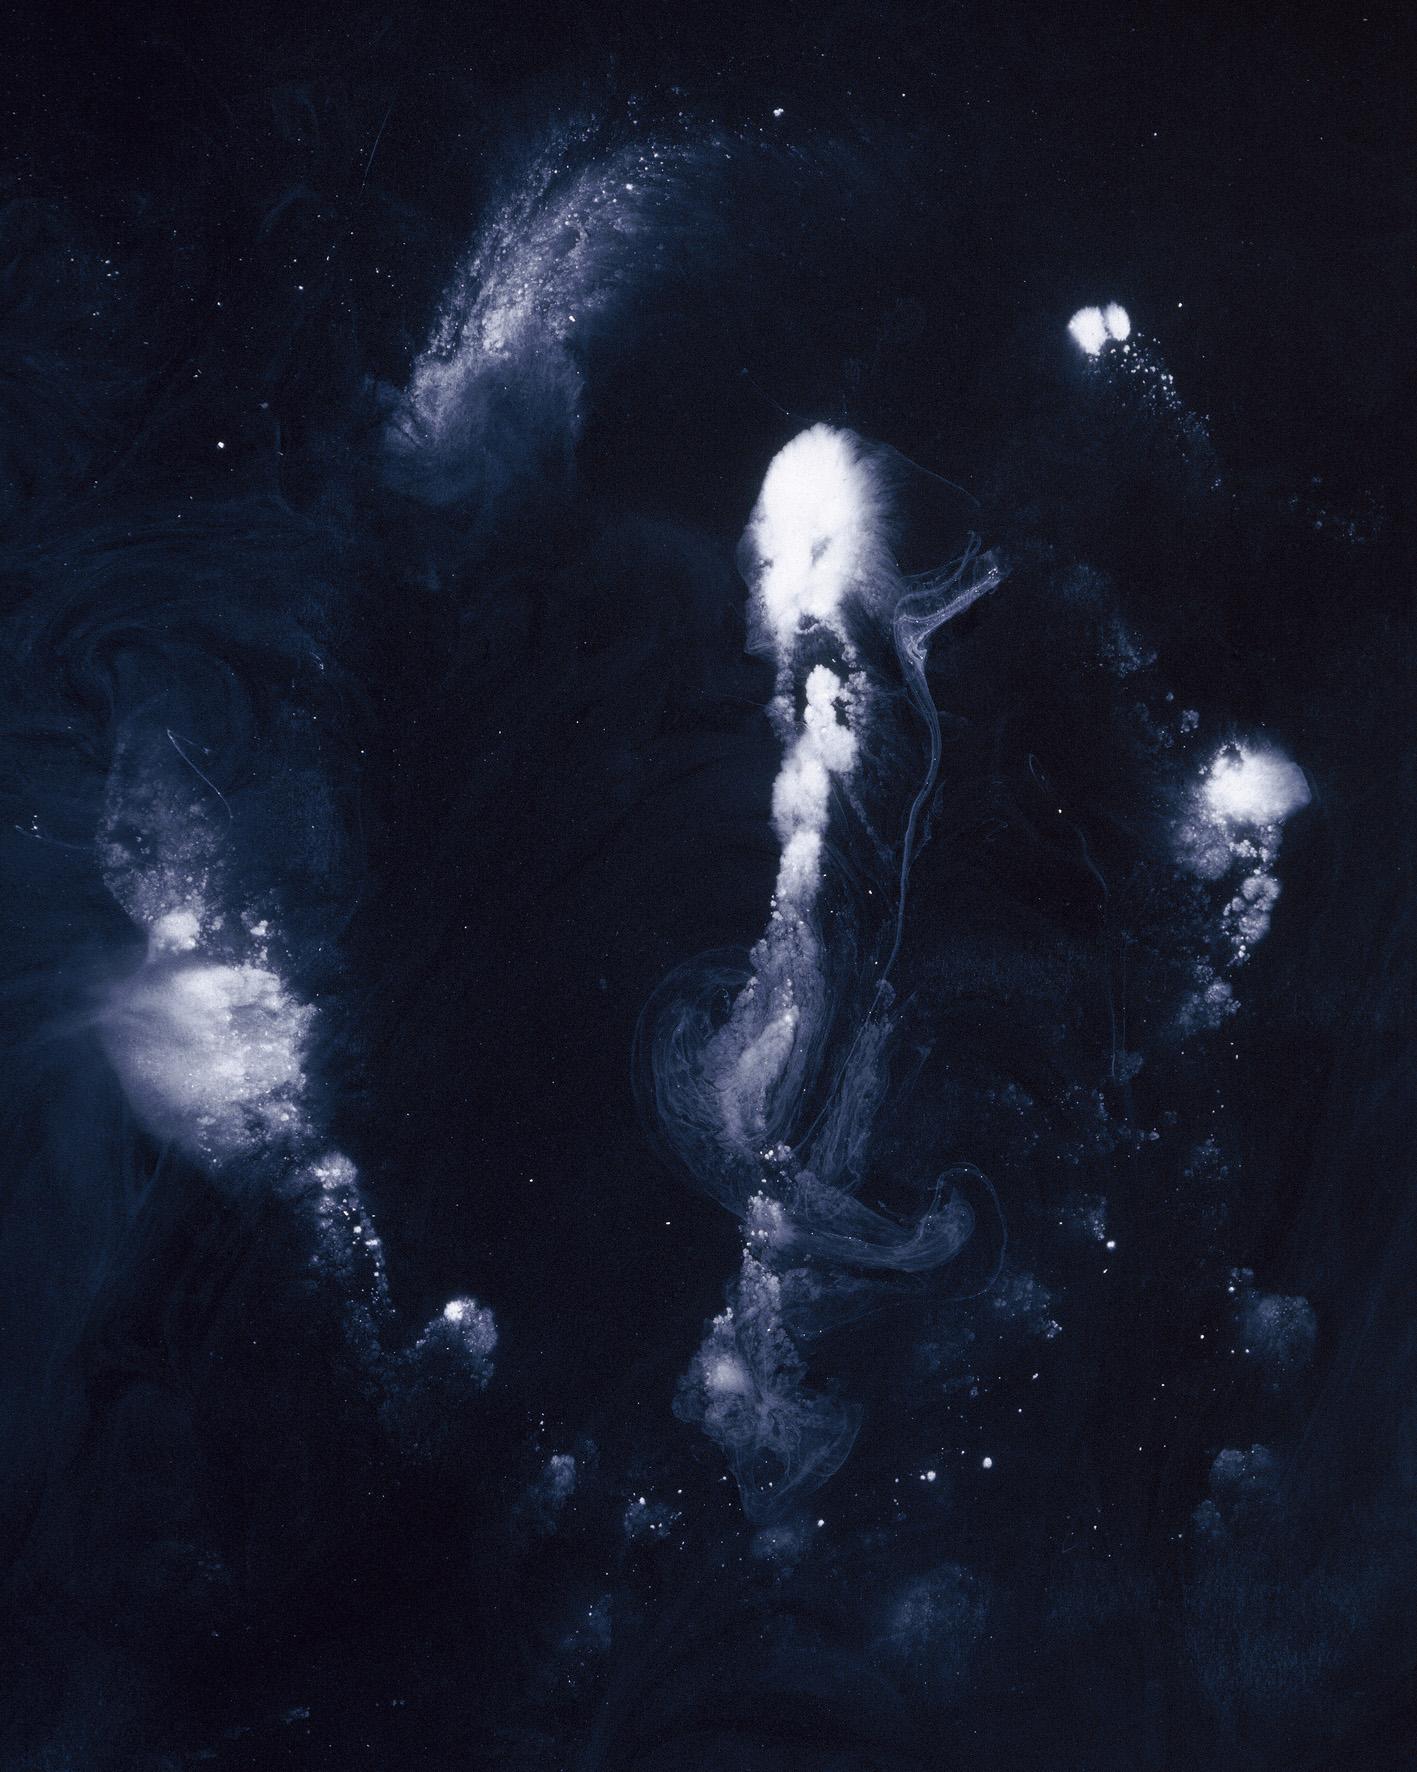 Senza Titolo, XIII, 2009